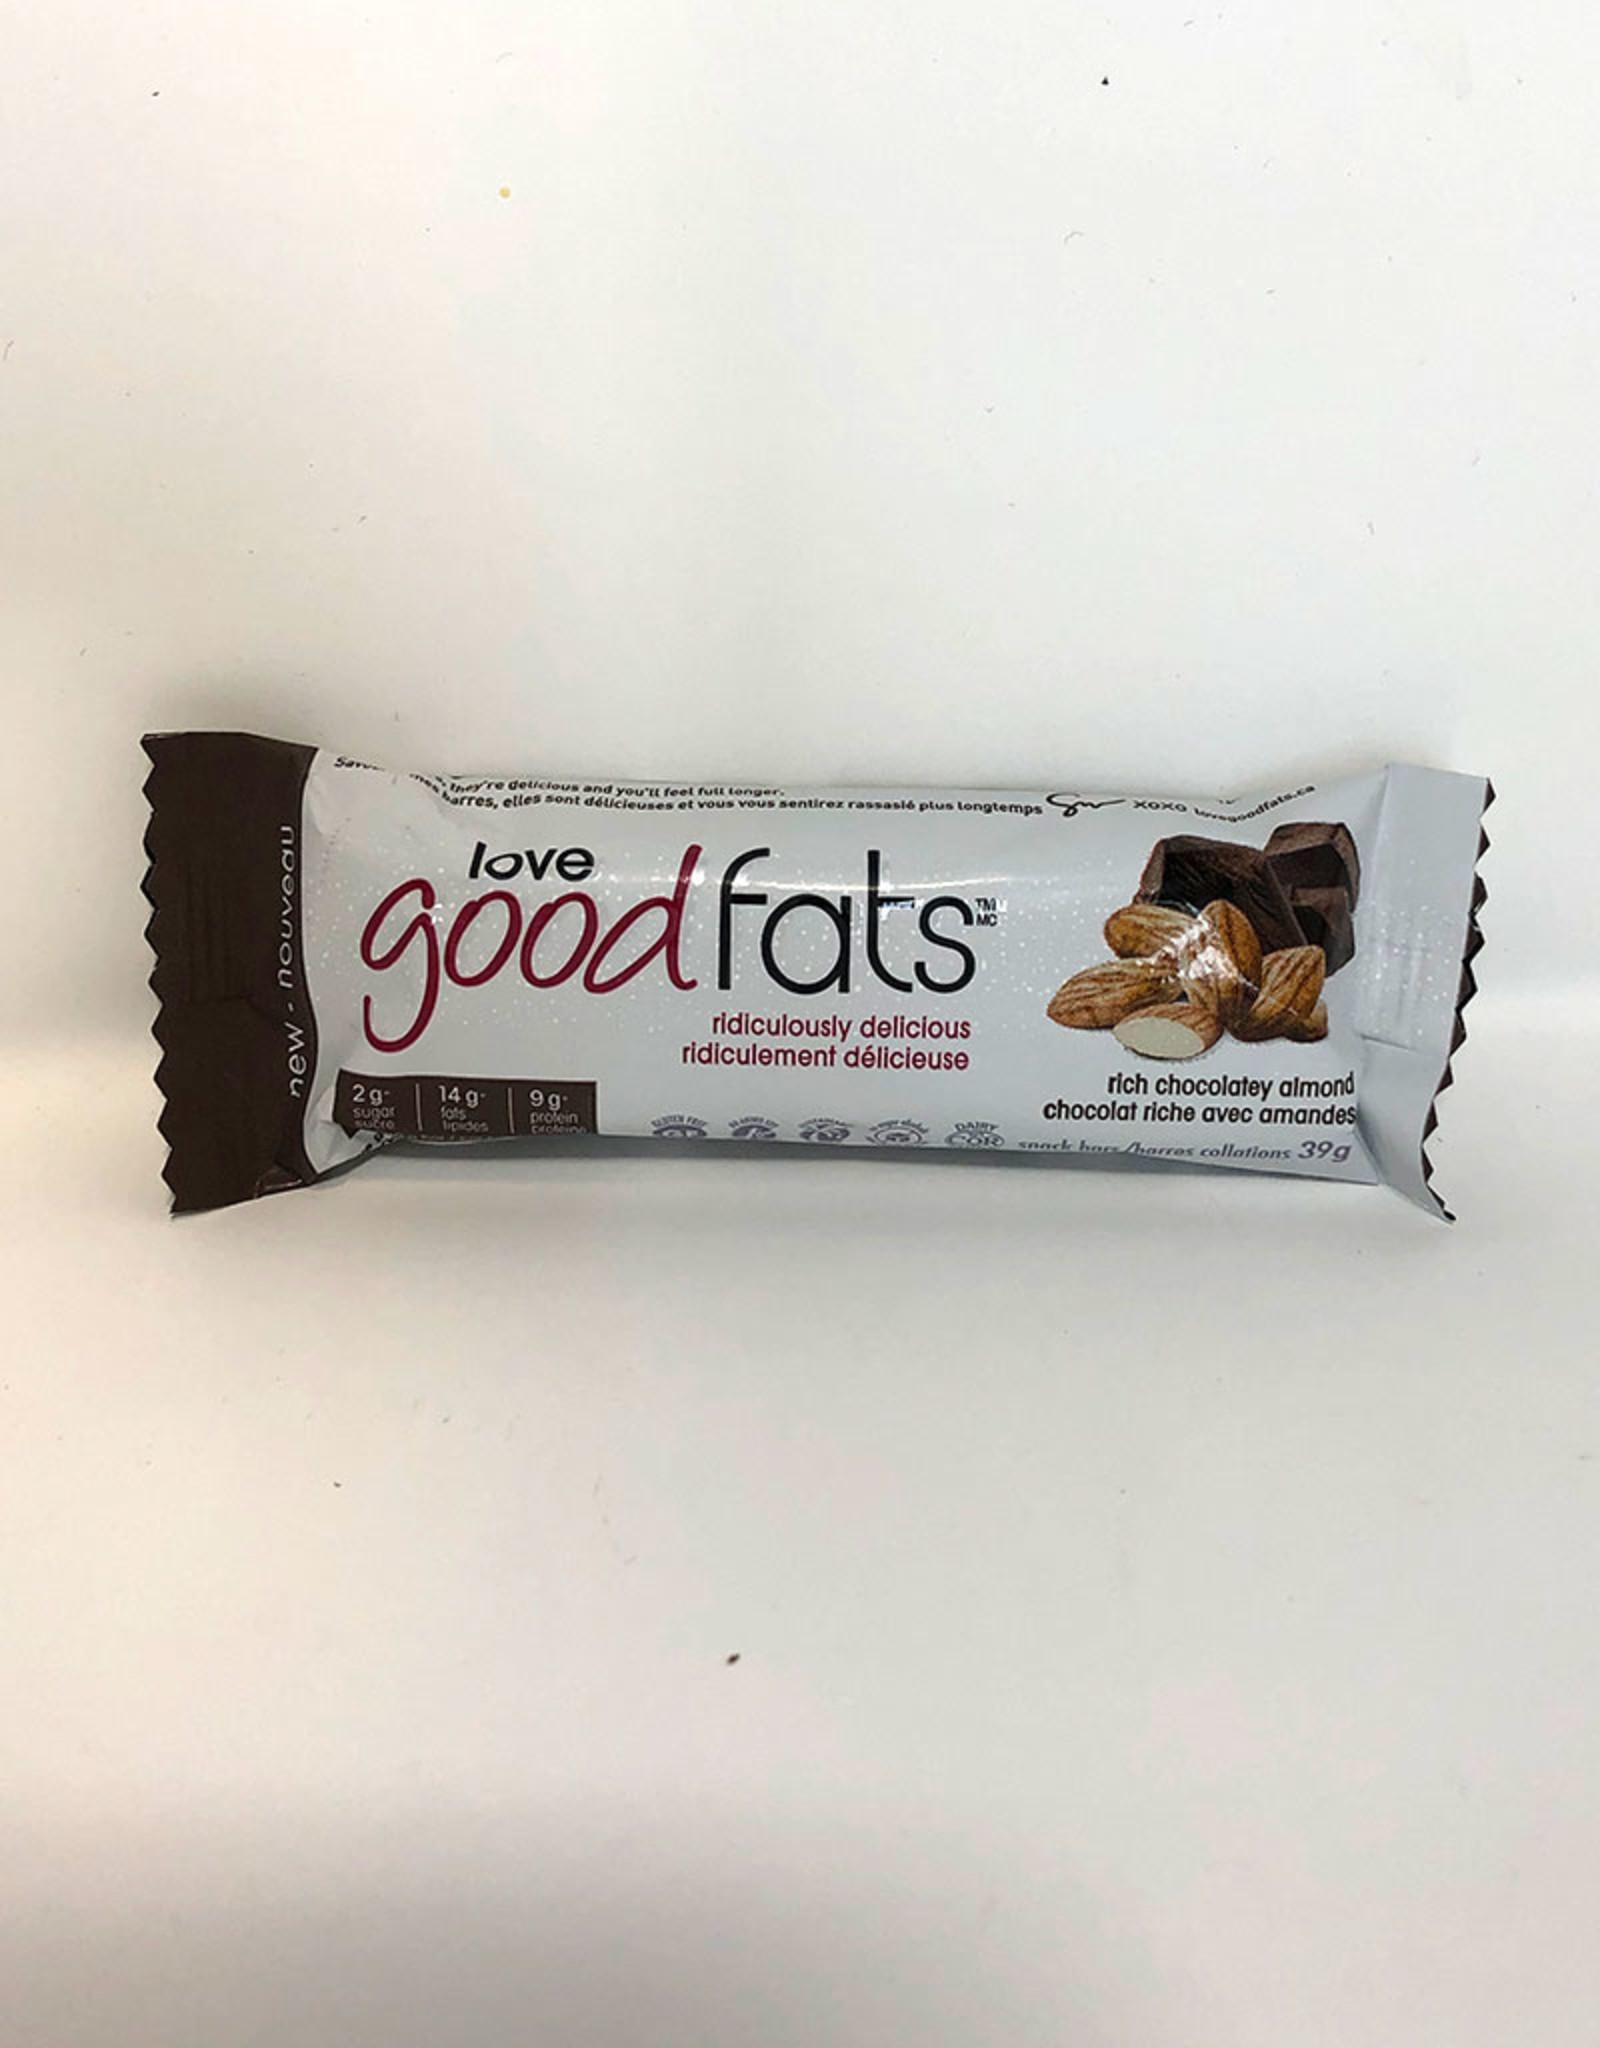 Love Good Fats Love Good Fats - Rich Chocolatey Almond